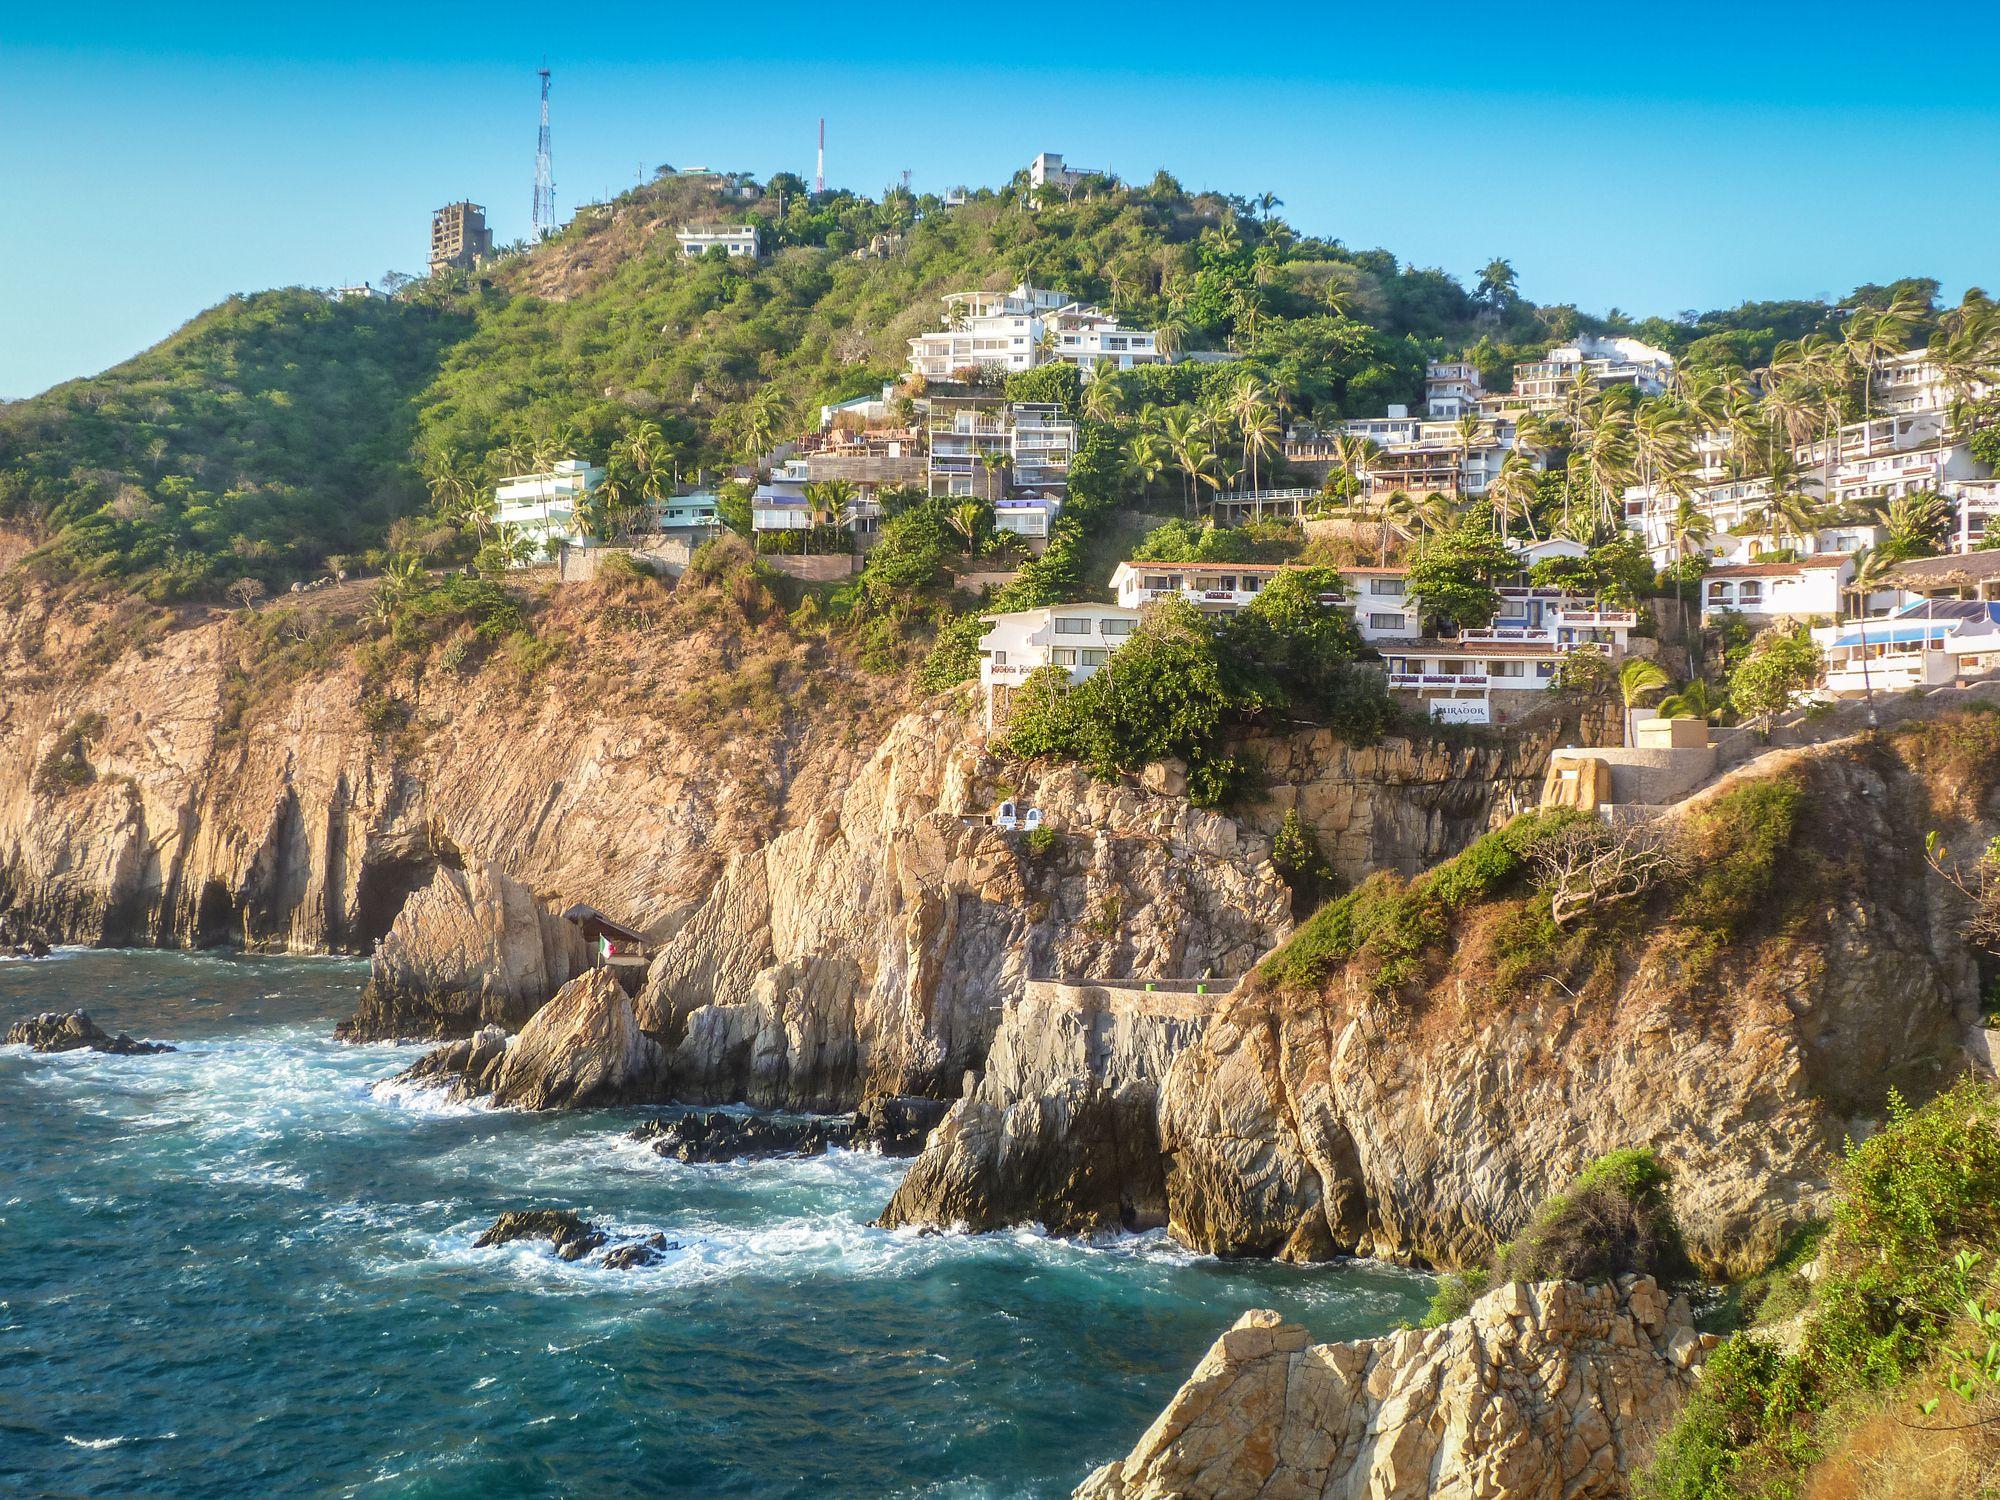 Acapulco coastline